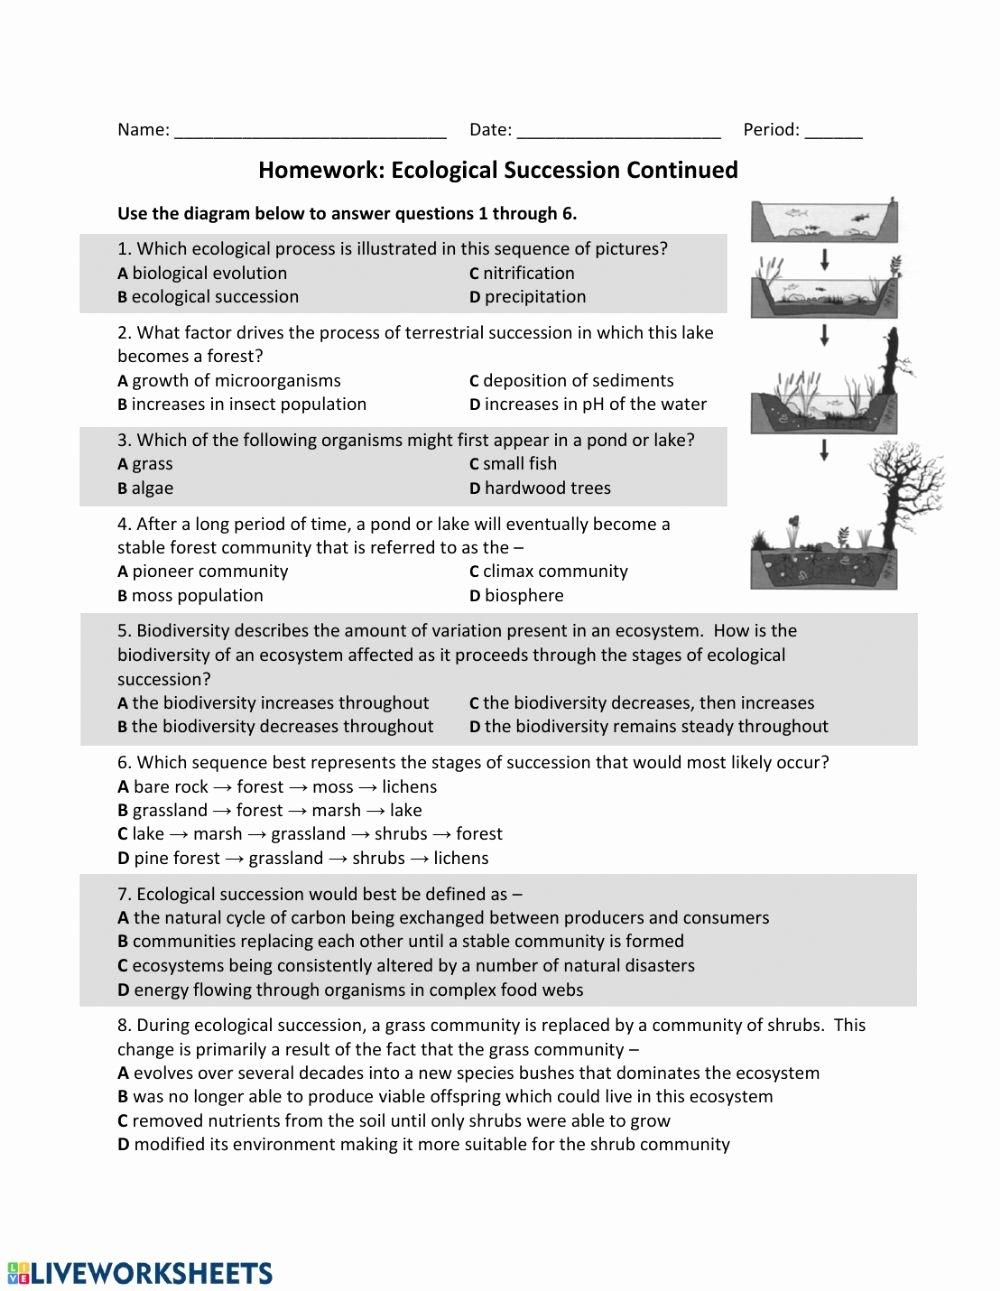 Ecological Succession Worksheet High School Printable Es Eco Succession Part 2 Interactive Worksheet